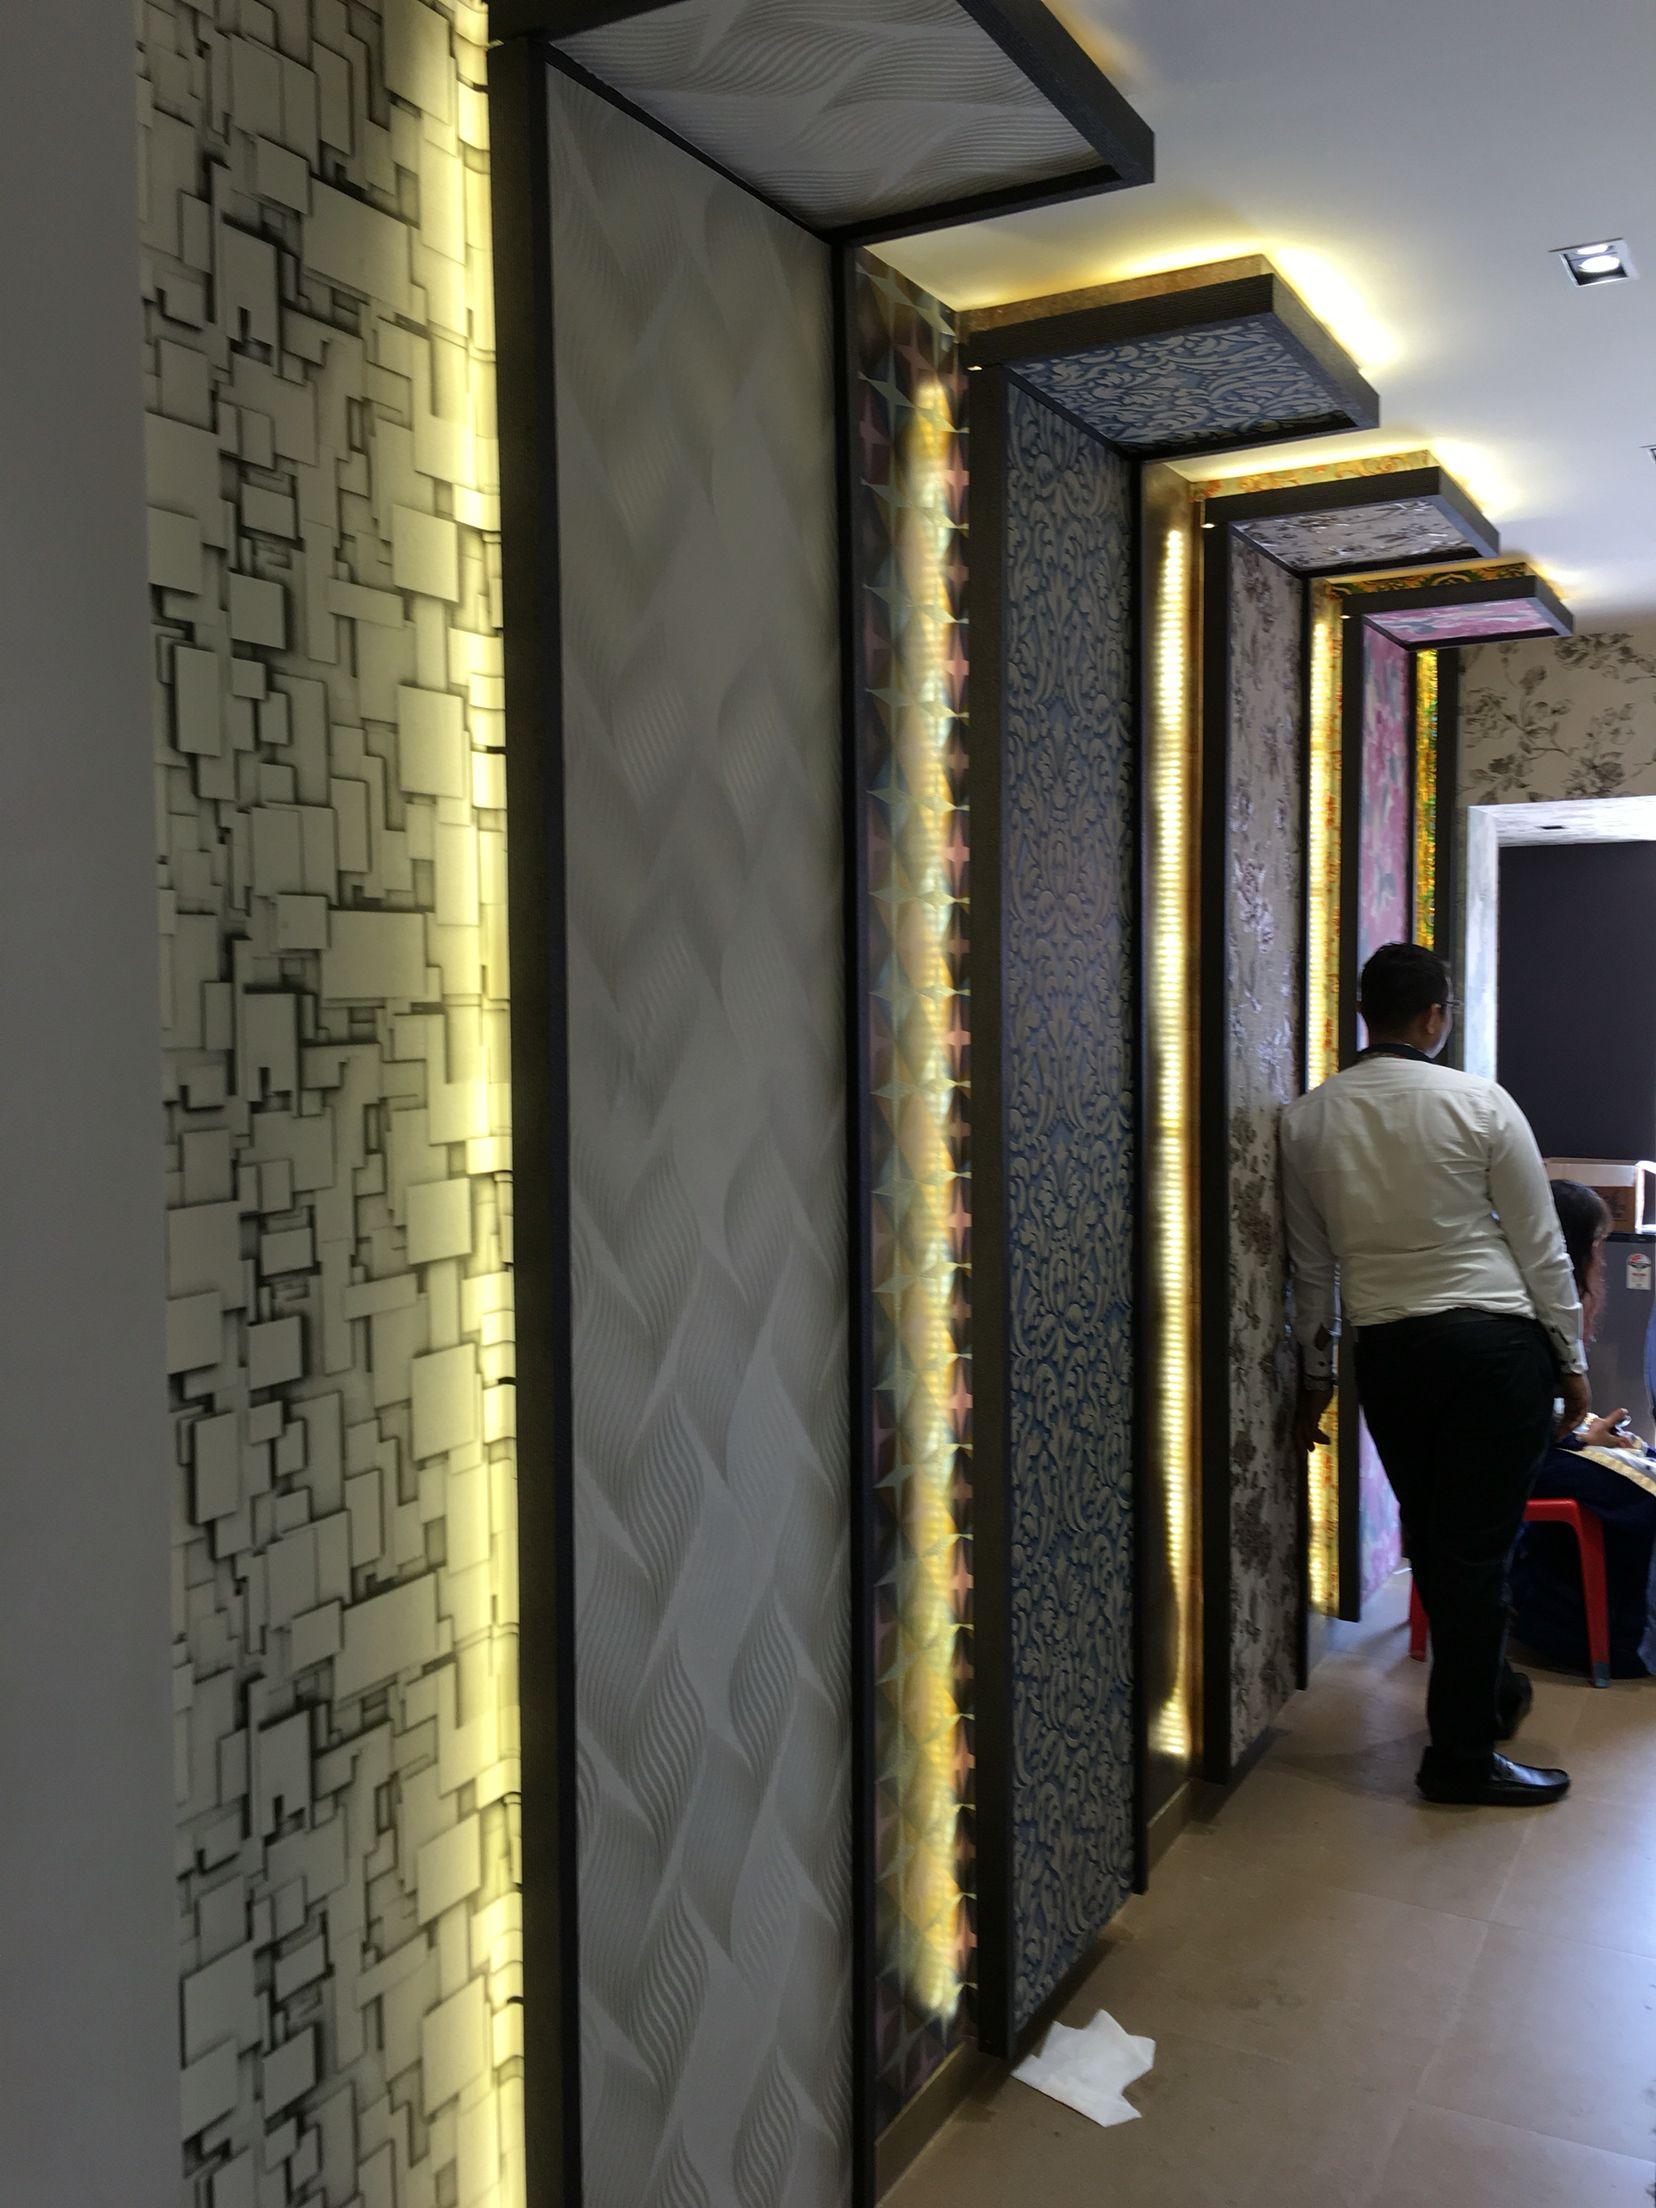 Wallpaper Display Panel Showroom Walldisplay Wallpaper Display Showroom Decor Showroom Interior Design